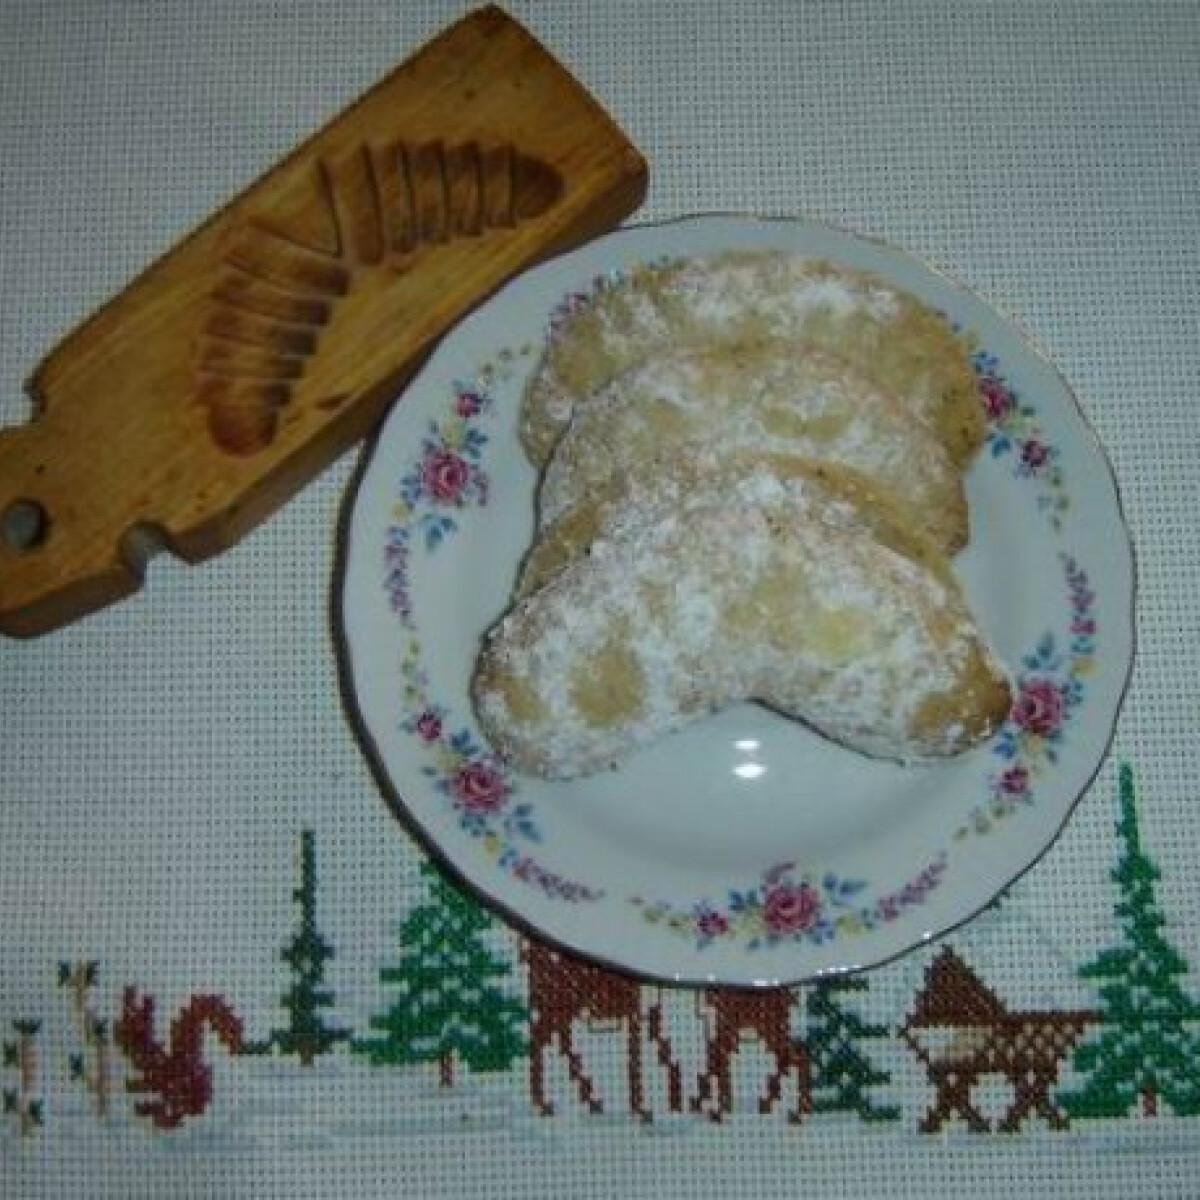 Diós kifli - sütőporos